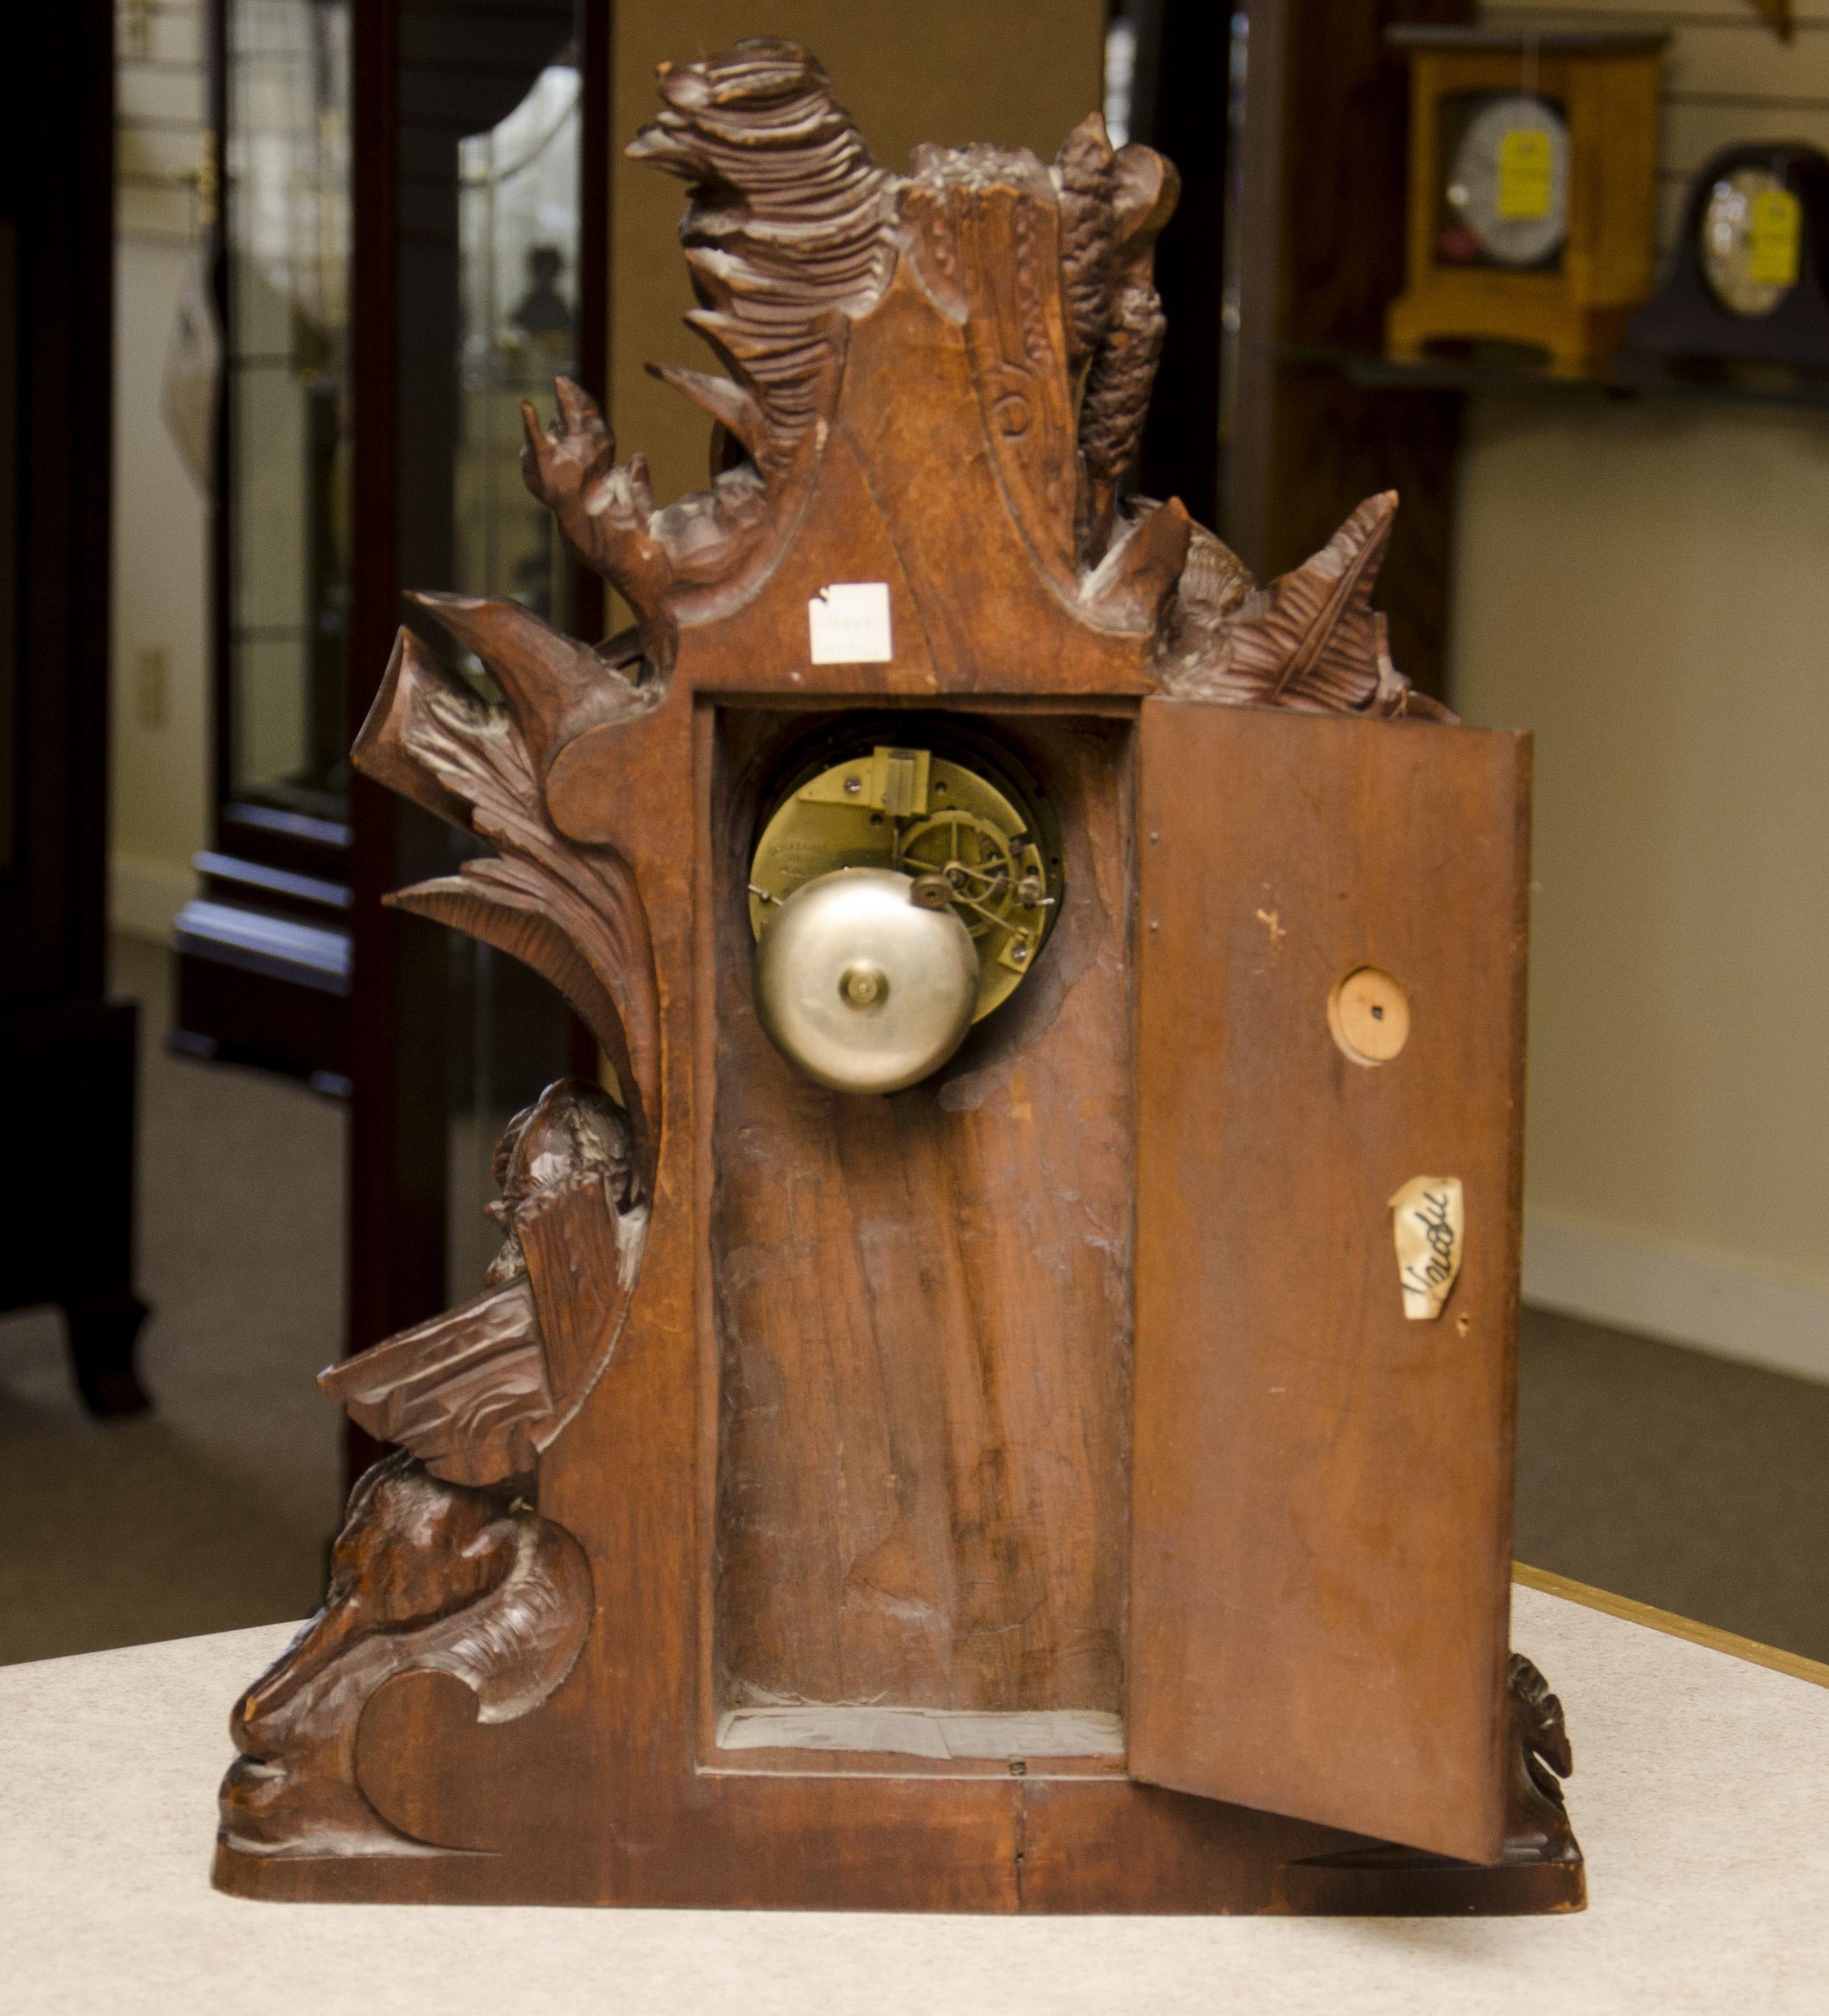 20140321_135012_House of Clocks